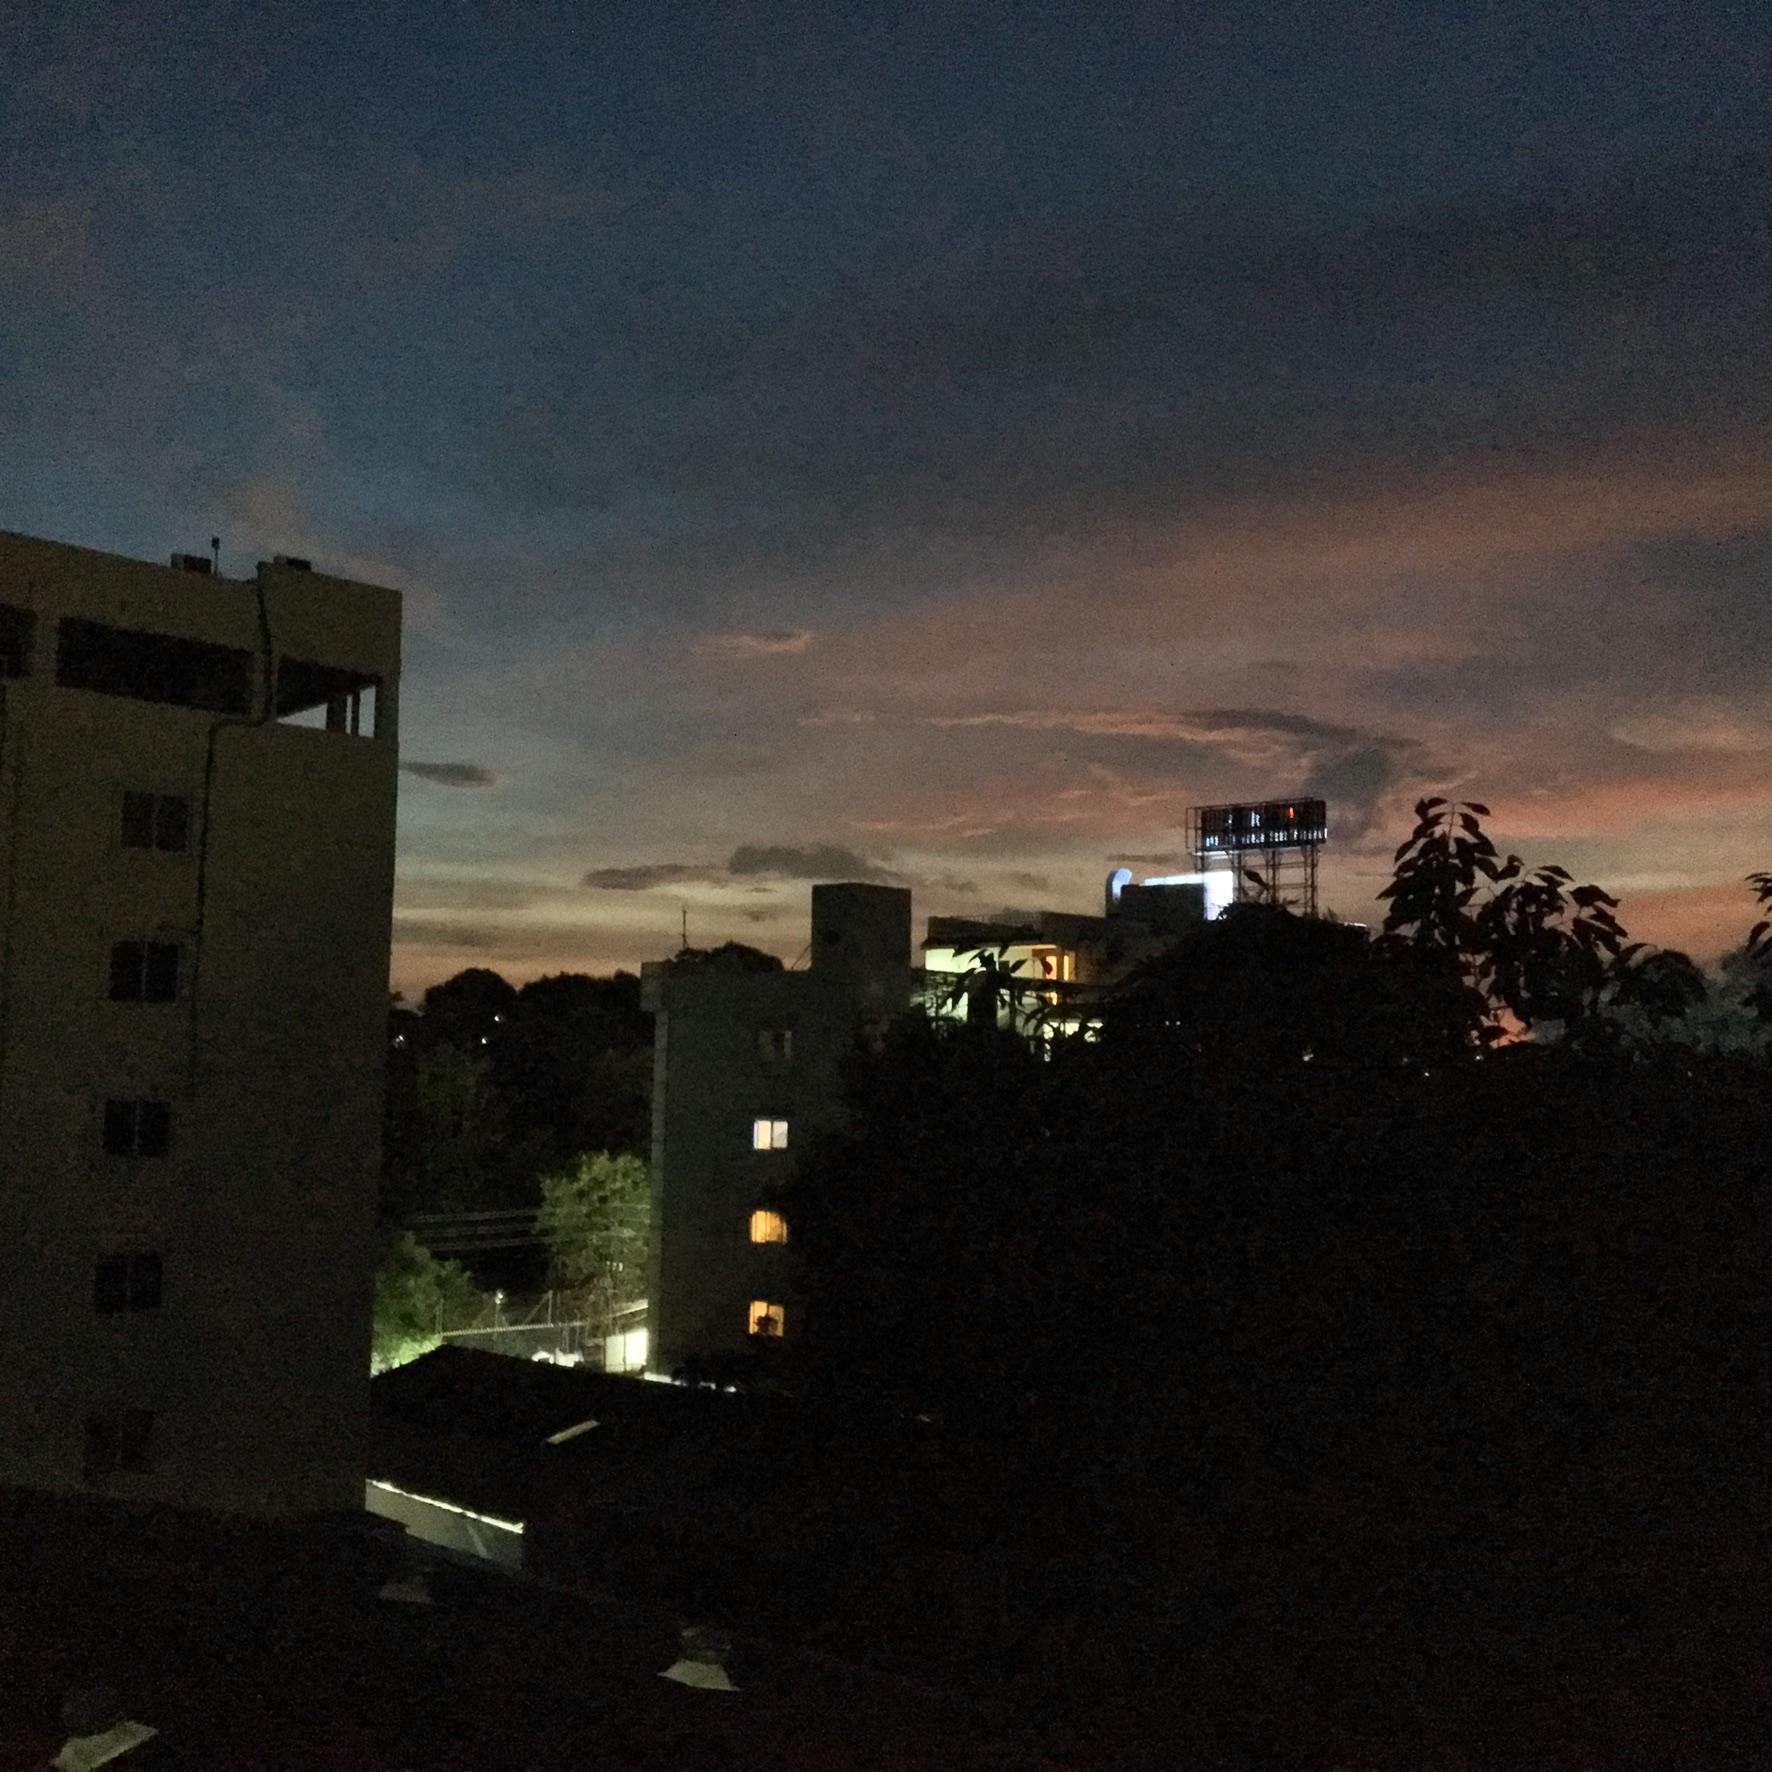 Image ID: 201249